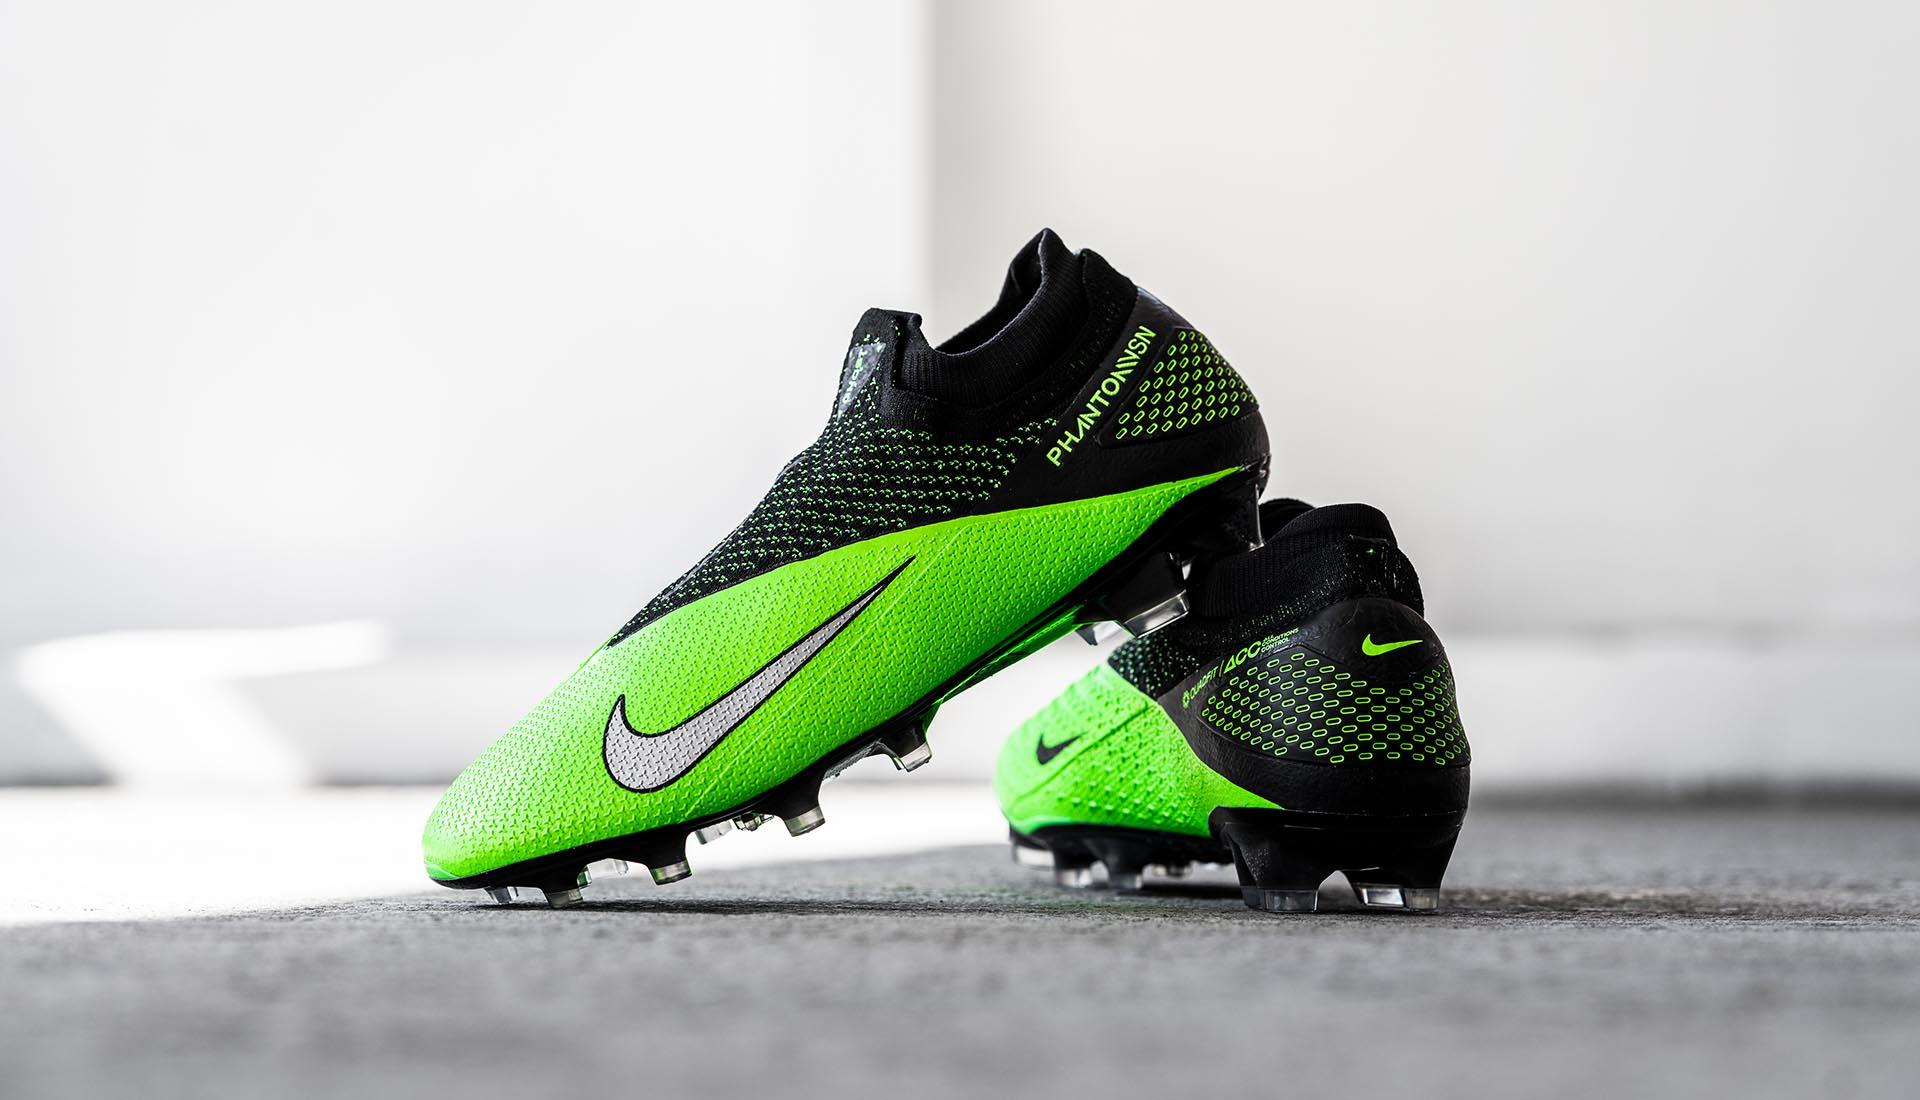 Bo suu tap giay da bong Nike Future lab 2 (II) nam 2020 (15)